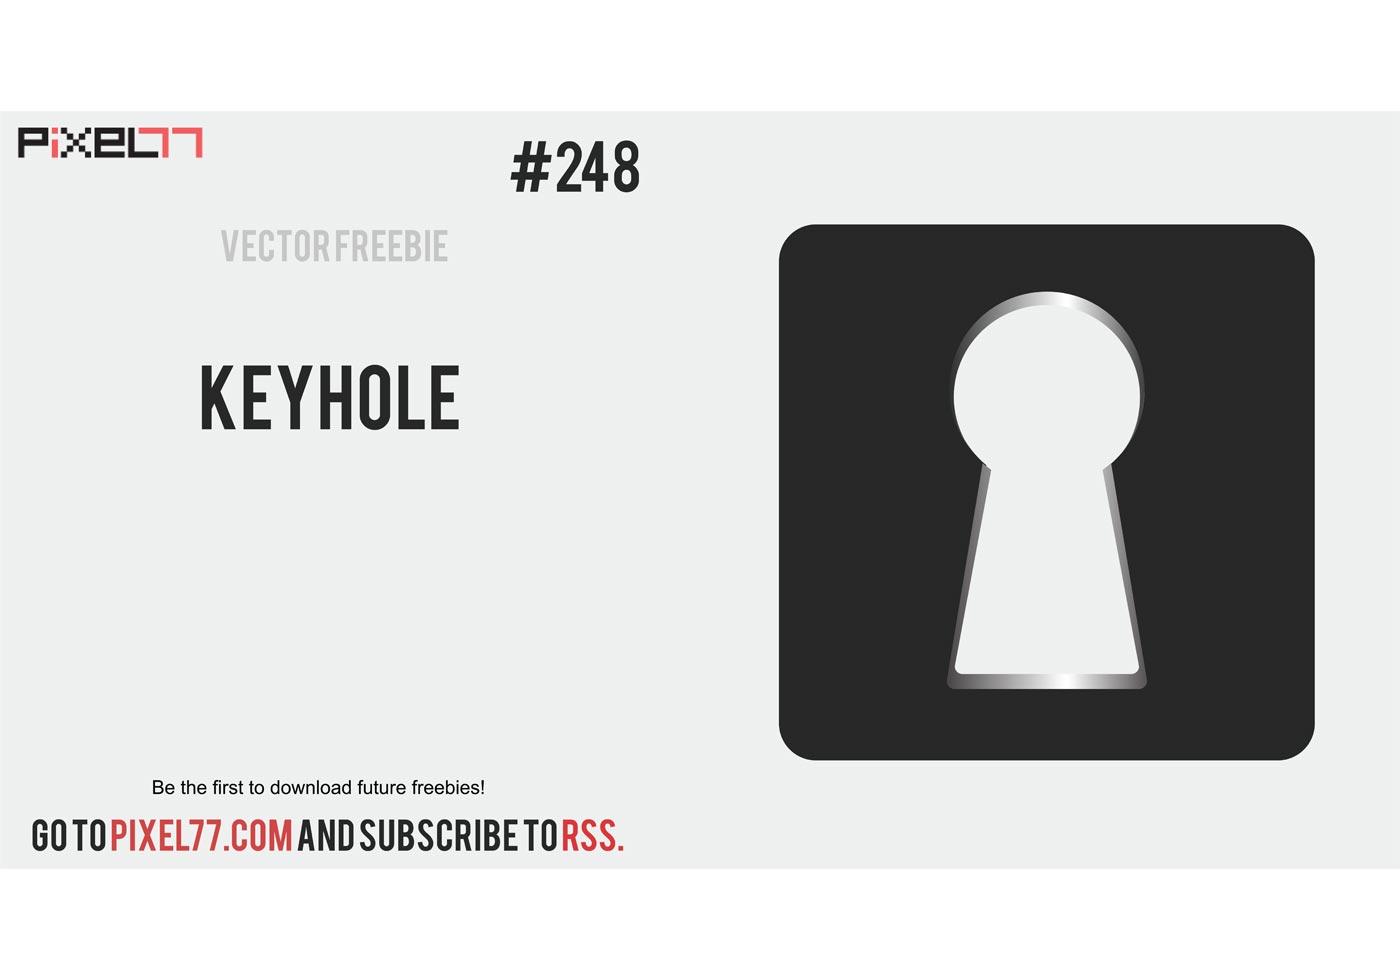 Keyhole Vector Free Vector Art At Vecteezy